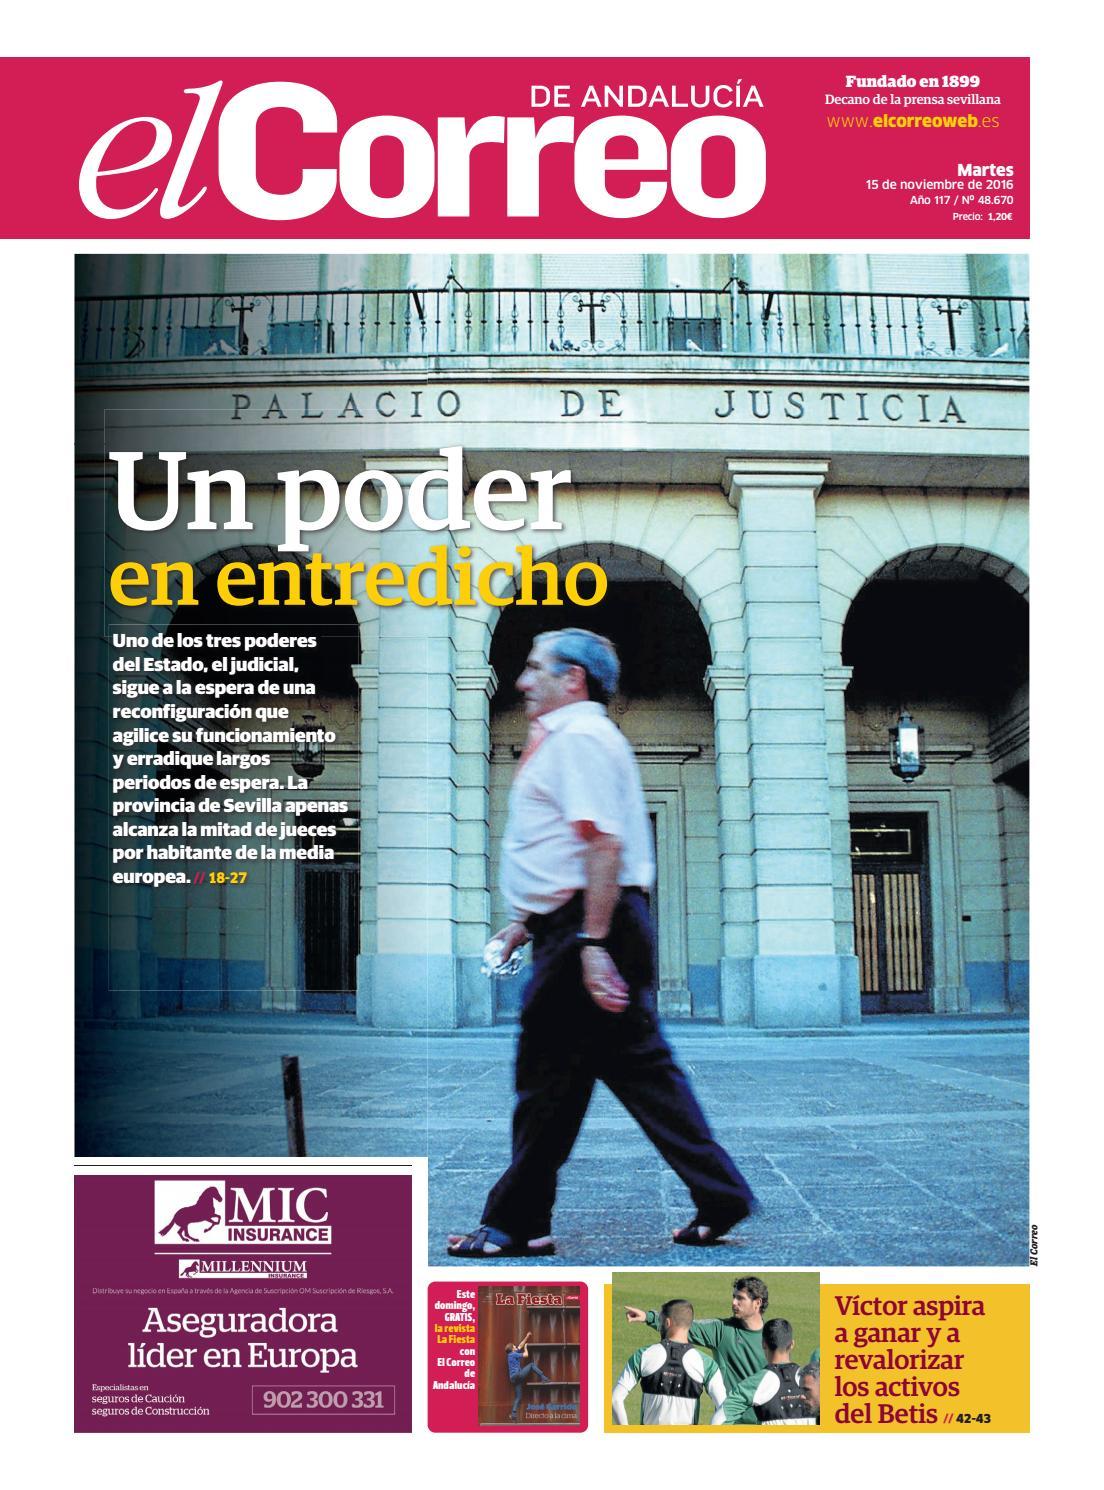 15 11 2016 El Correo de Andalucía by EL CORREO DE ANDALUCÍA S.L. - issuu 971e252871da0